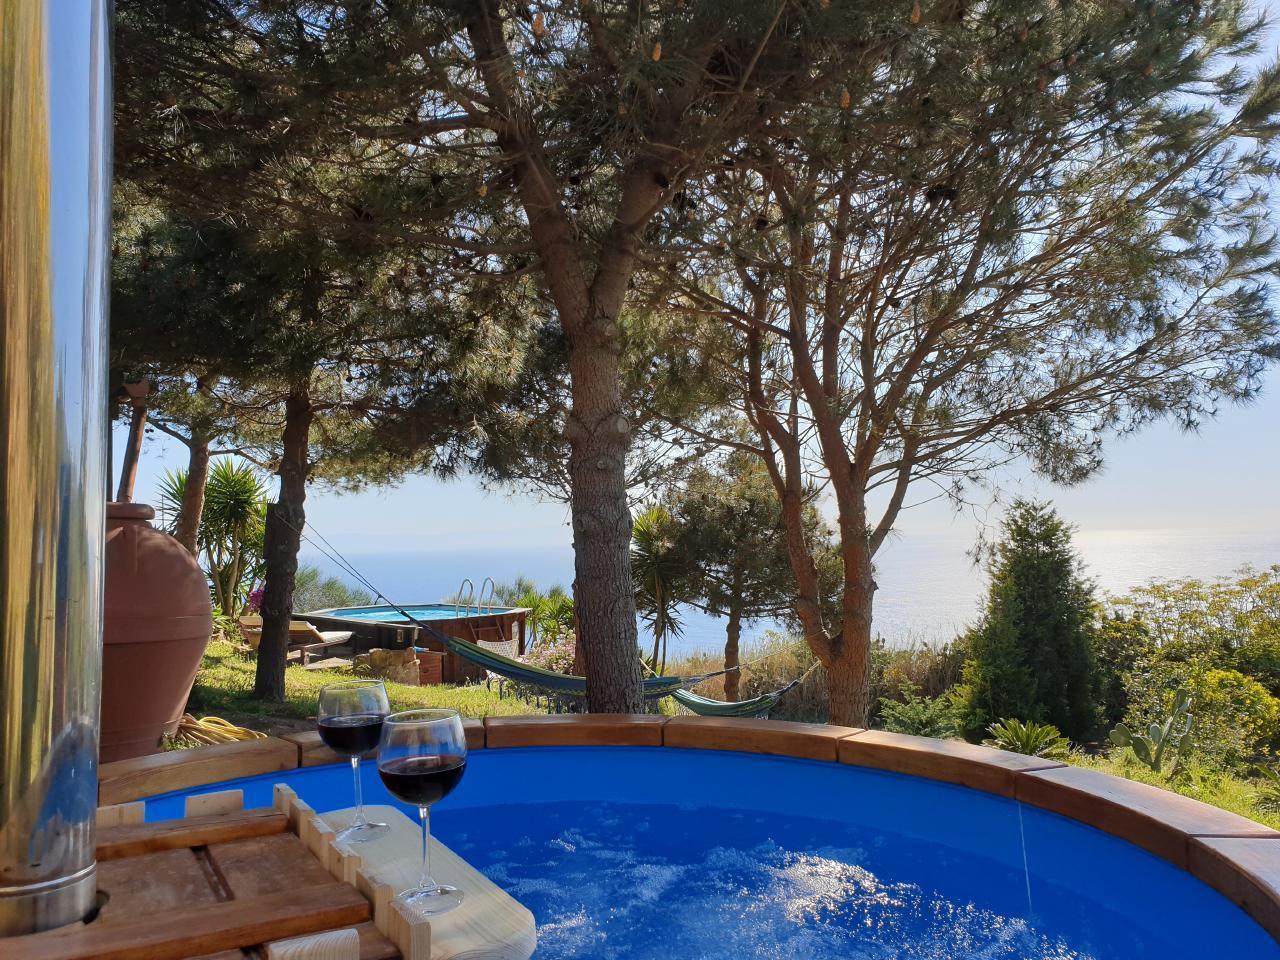 Maison de vacances Casetta Eoliana Lipari Inseln, pool, sauna. (827872), Lipari, Lipari, Sicile, Italie, image 33